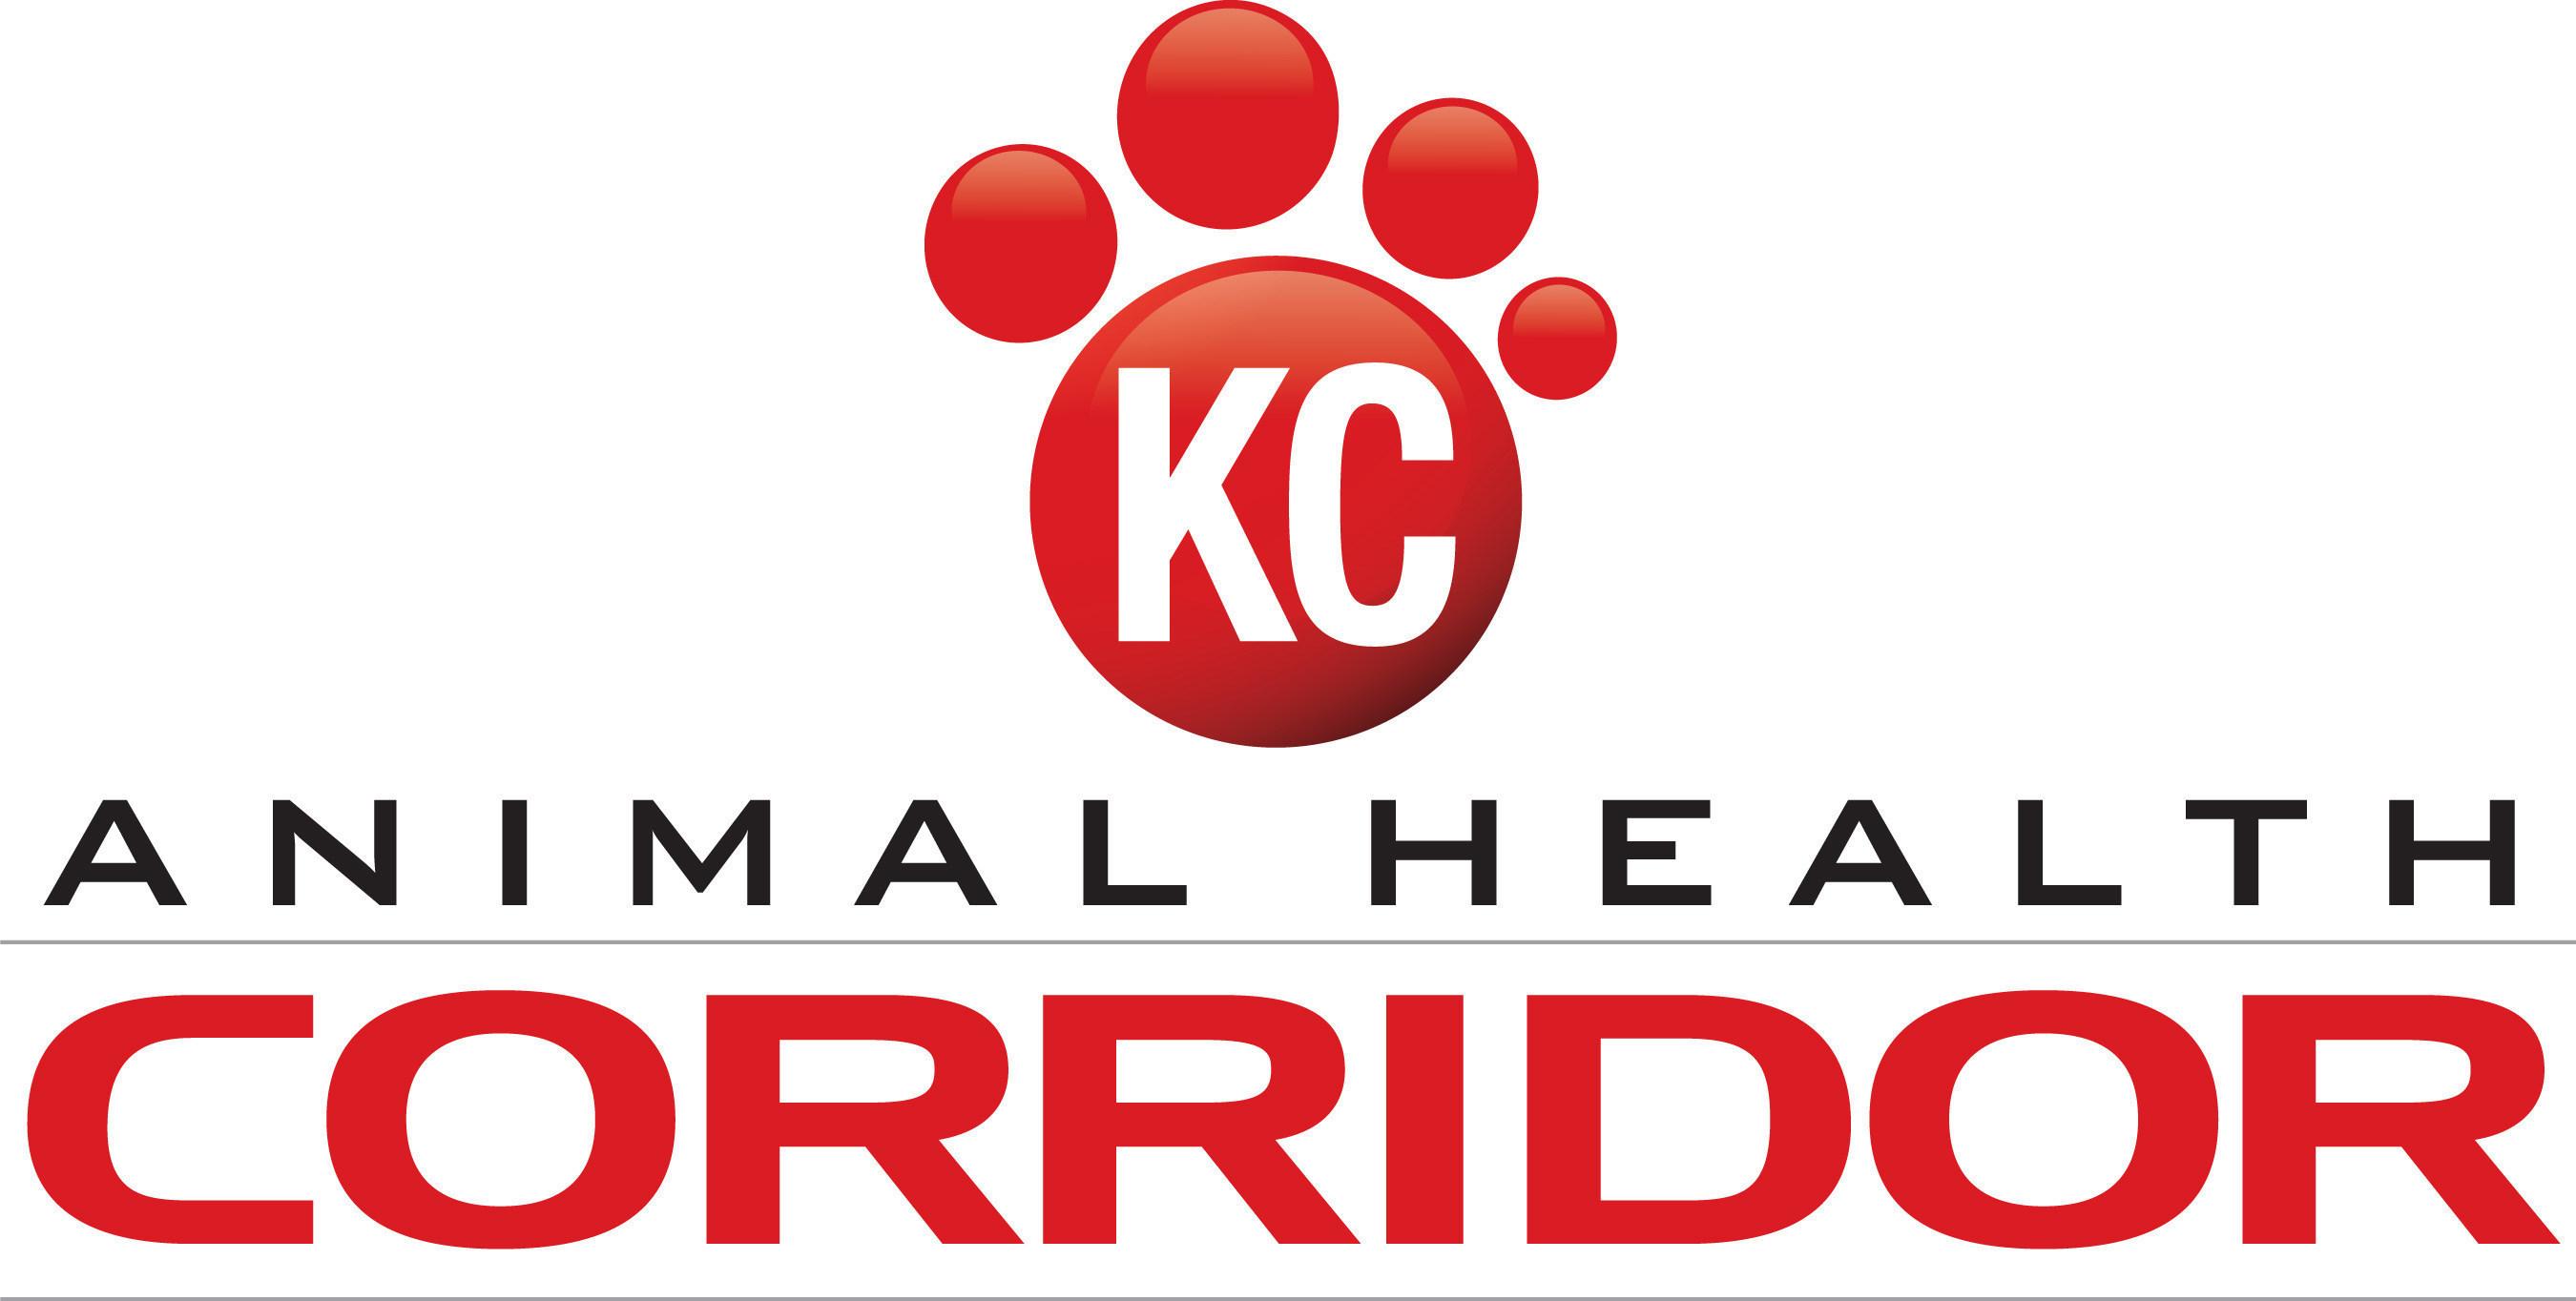 Kansas City Animal Health Corridor logo